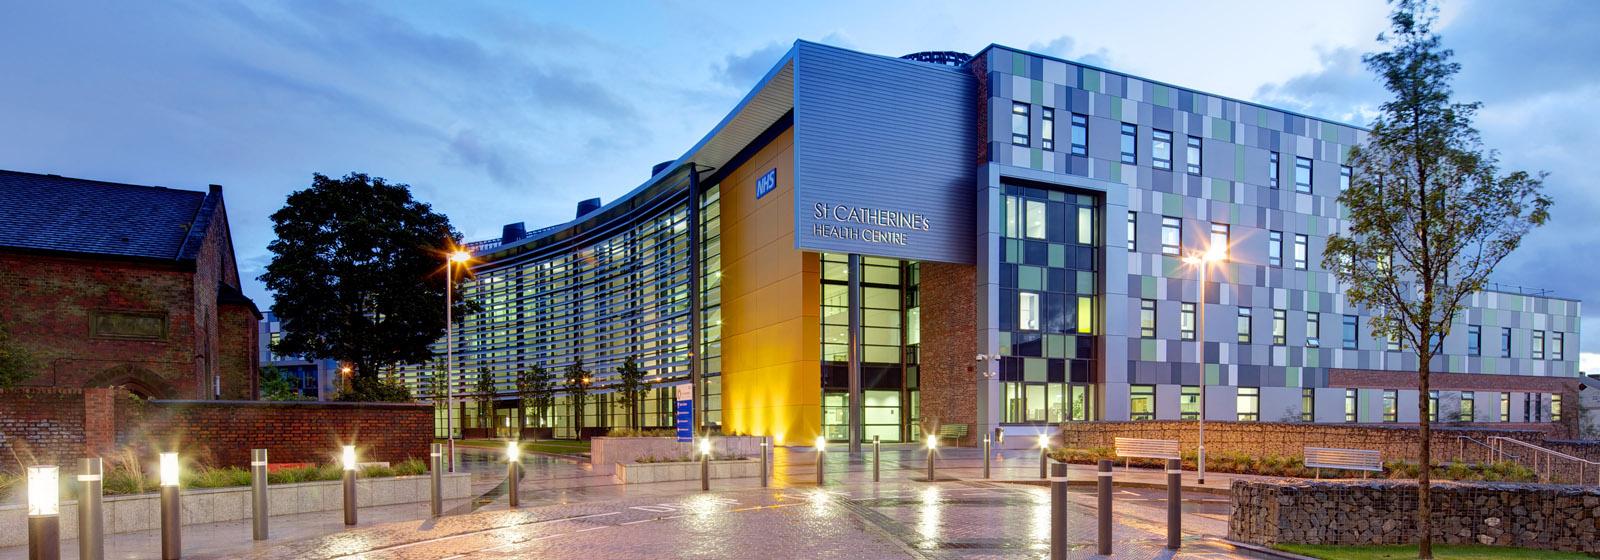 St Catherine's Health Centre - healthcare design